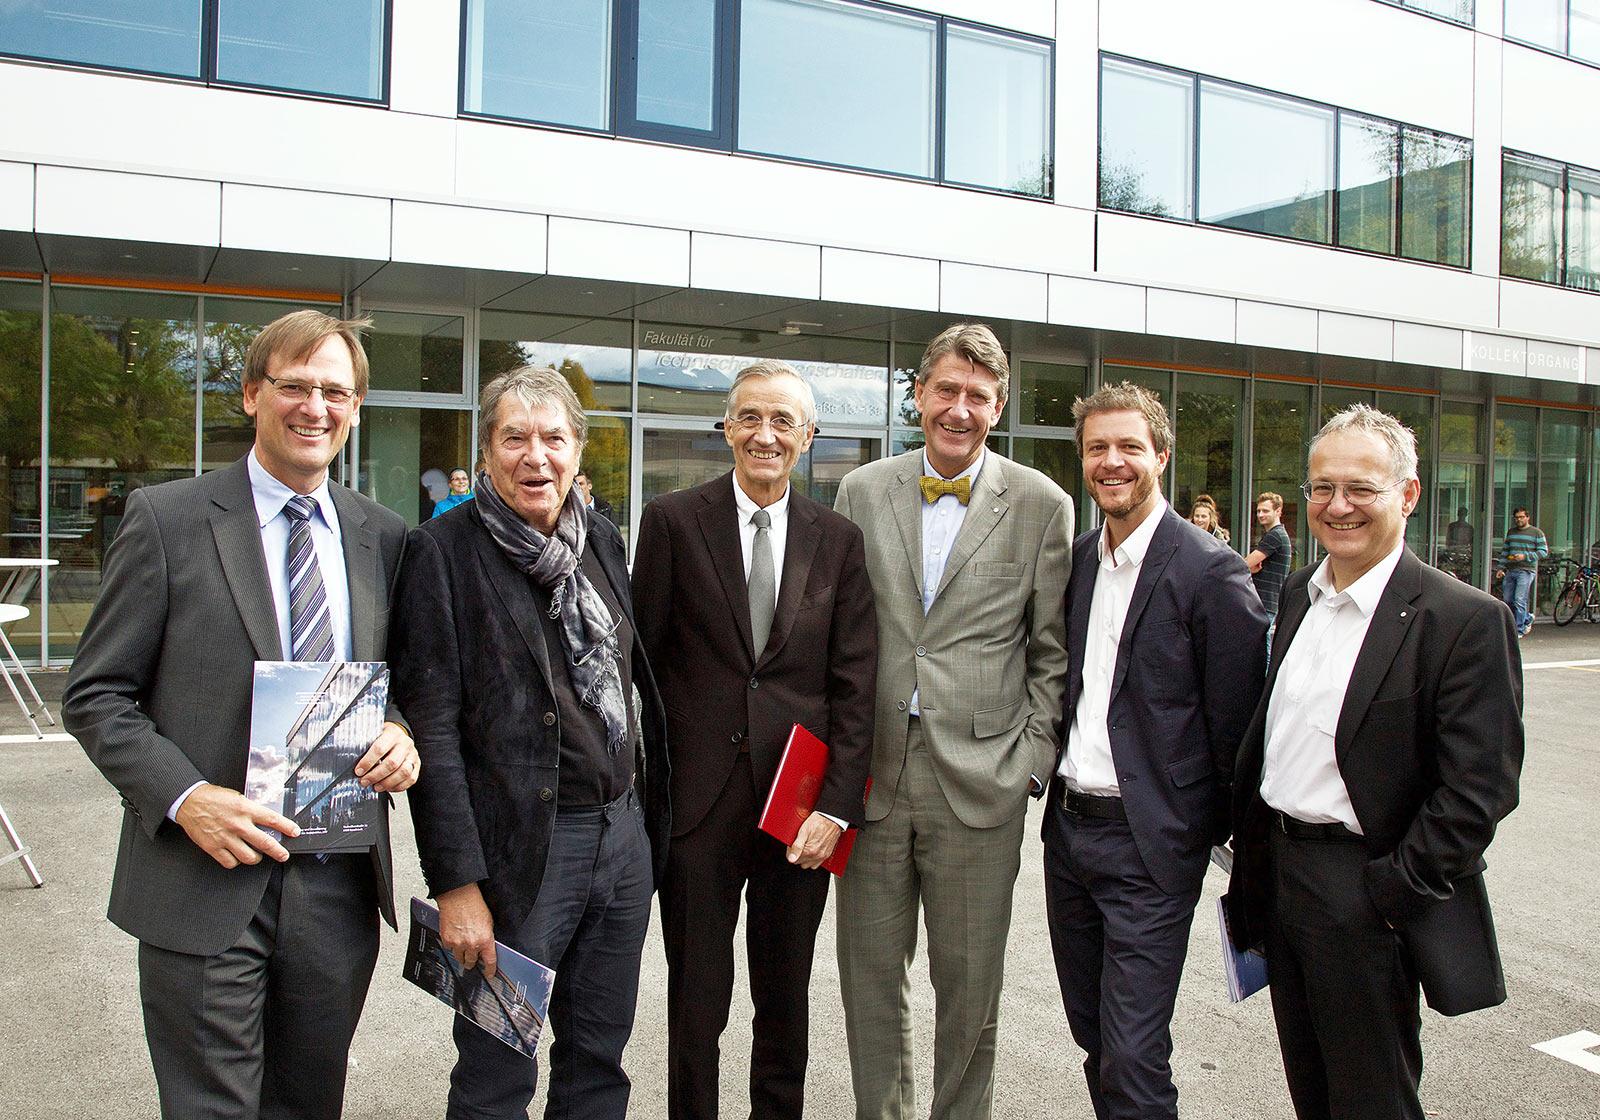 From left: Professor Dr. Arnold Tautschnig, Professor Dr. Arnold Klotz, Professor Dr. Dr. Tilmann D. Märk (Rector), Professor Christoph M. Achammer (CEO ATP), Architect Paul Ohnmacht (PLP, ATP), Architect Hans Kotek (GPL, ATP). Photo: ATP/Wett